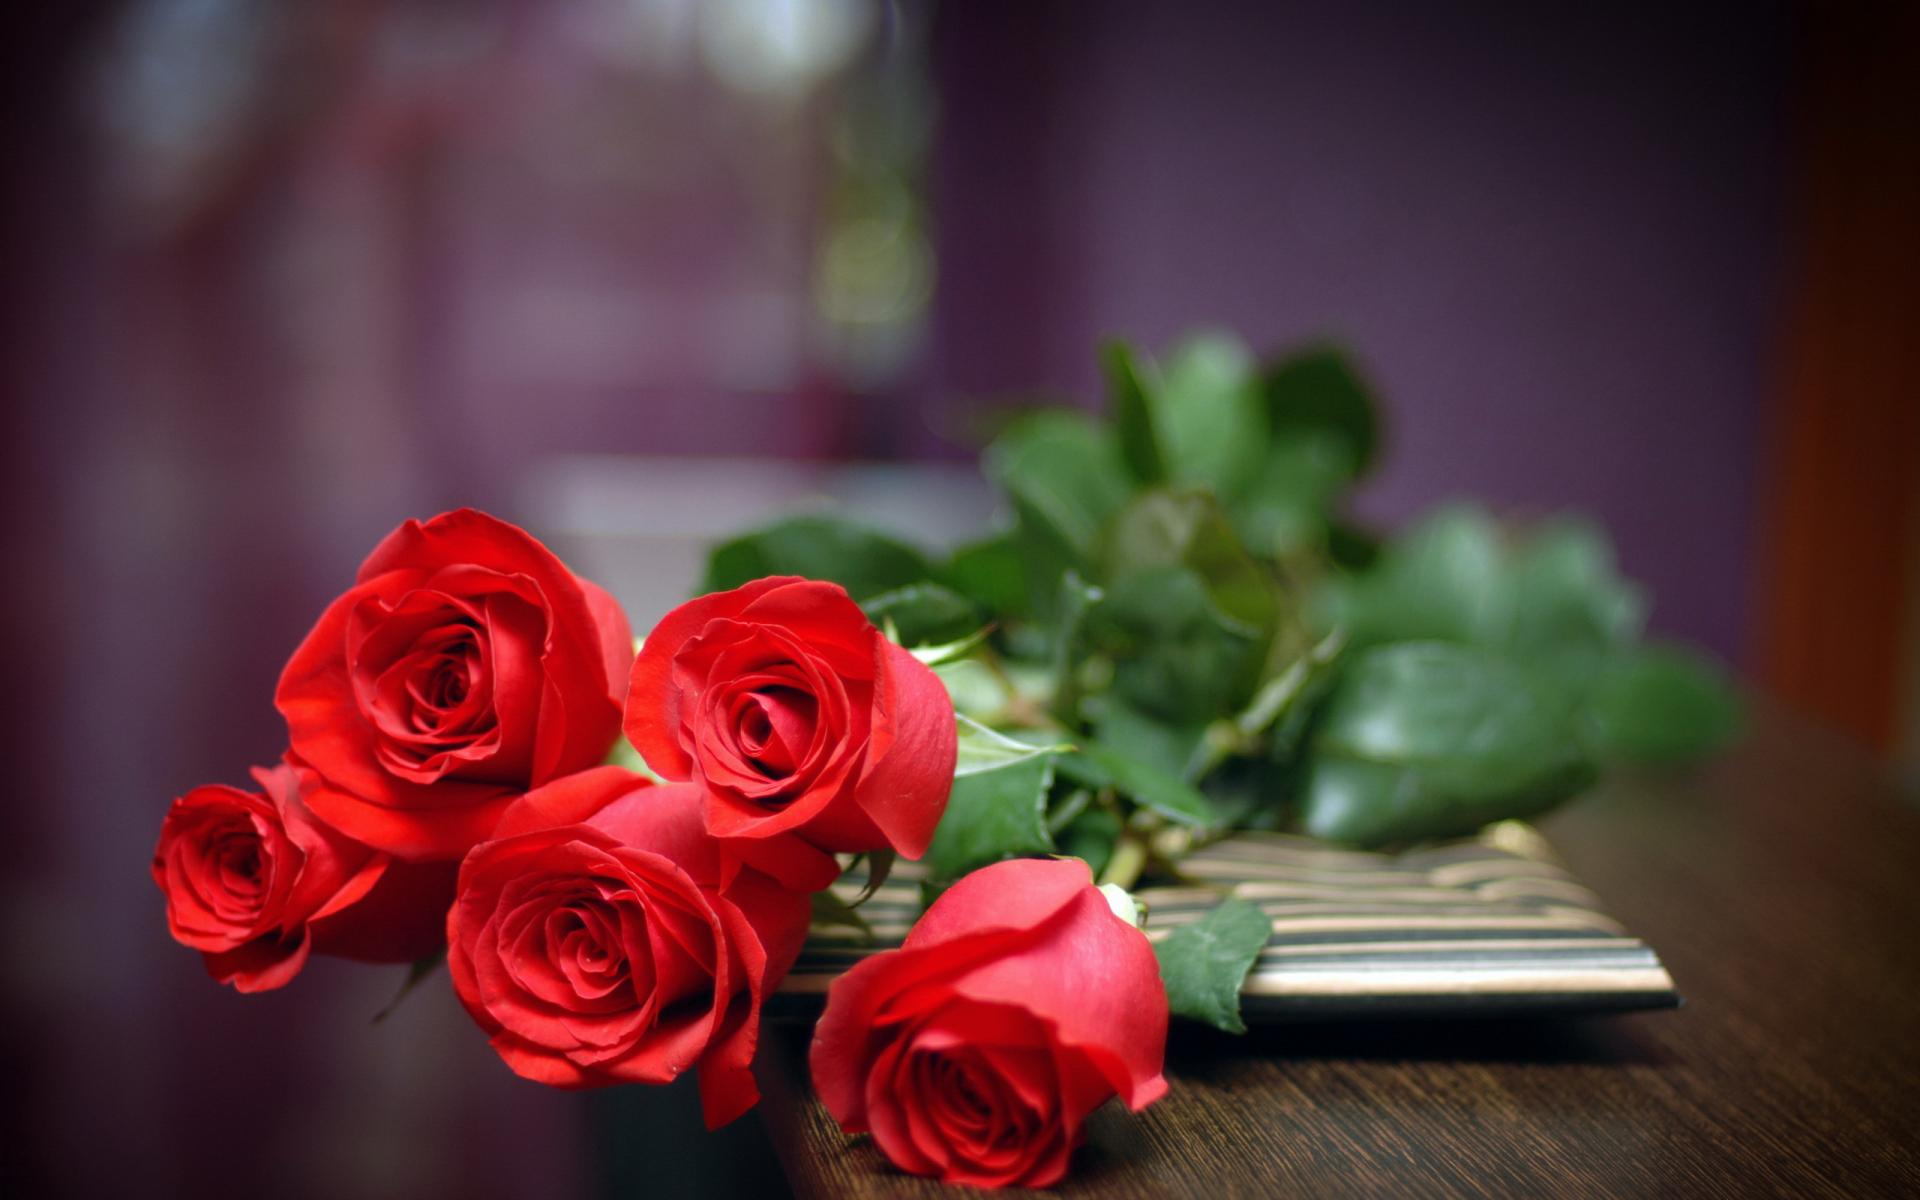 422561 cvety rozy beket 2560x1600 www gdefon ru